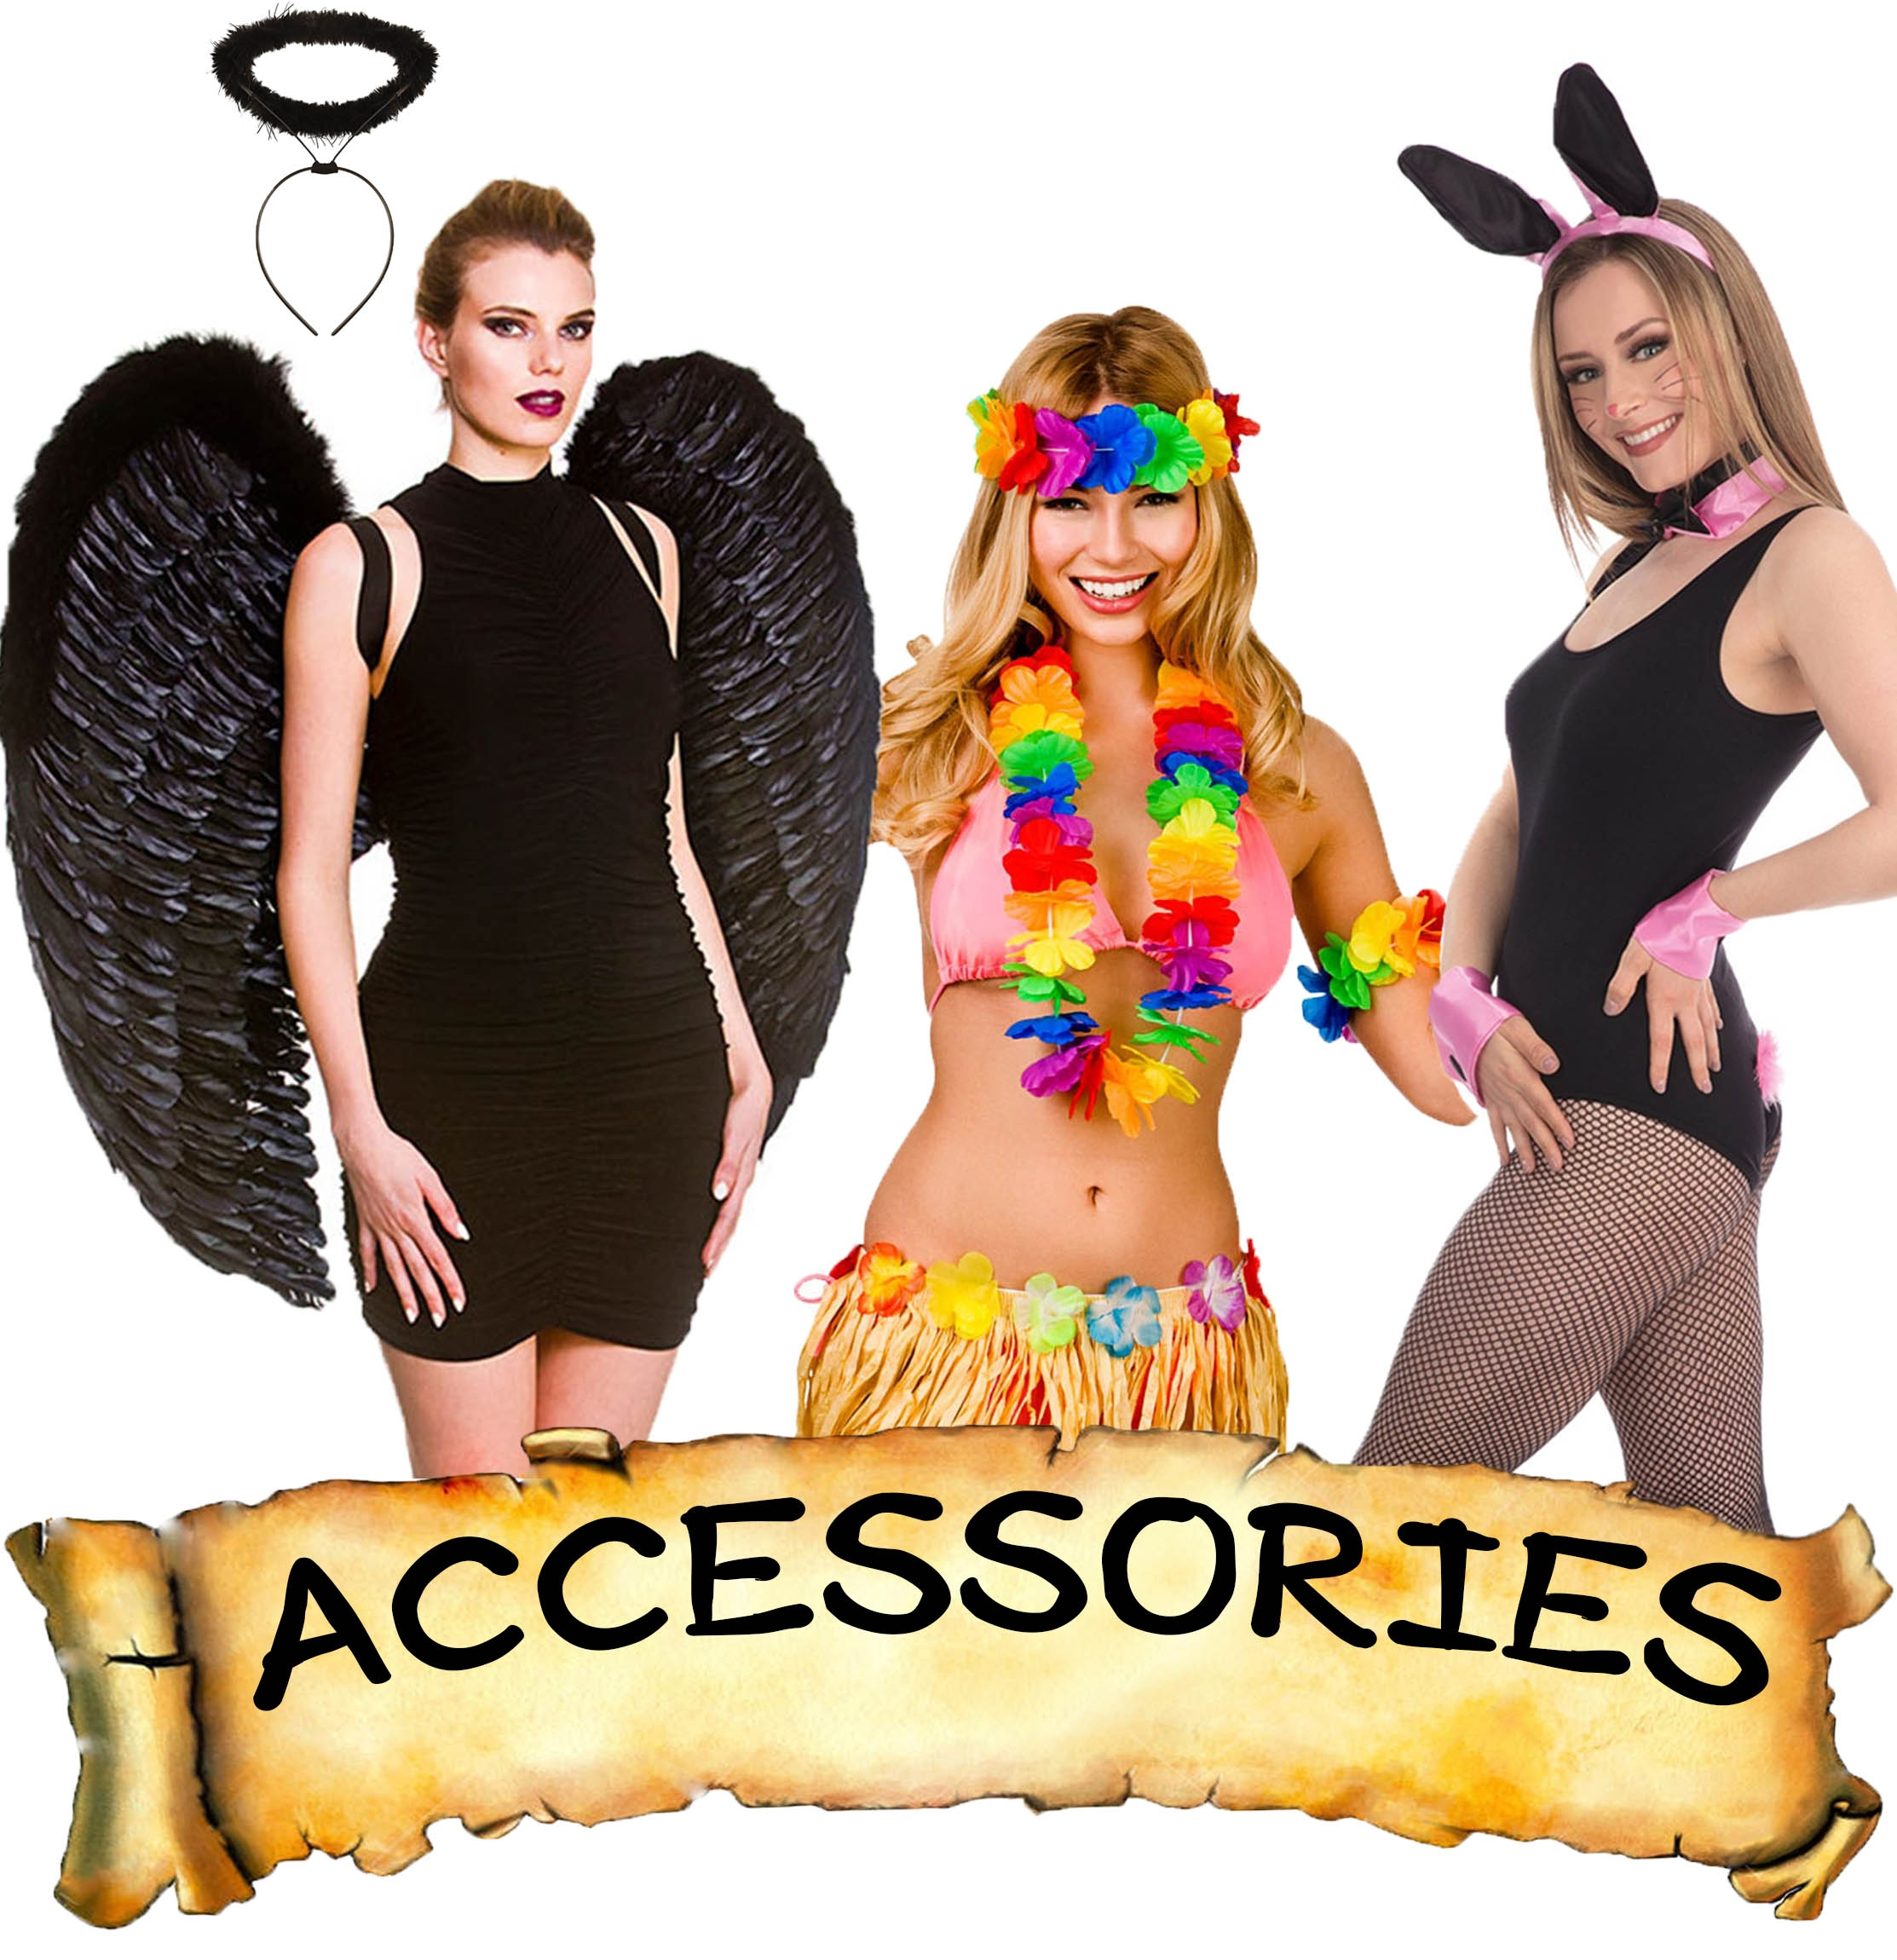 Hen Accessories